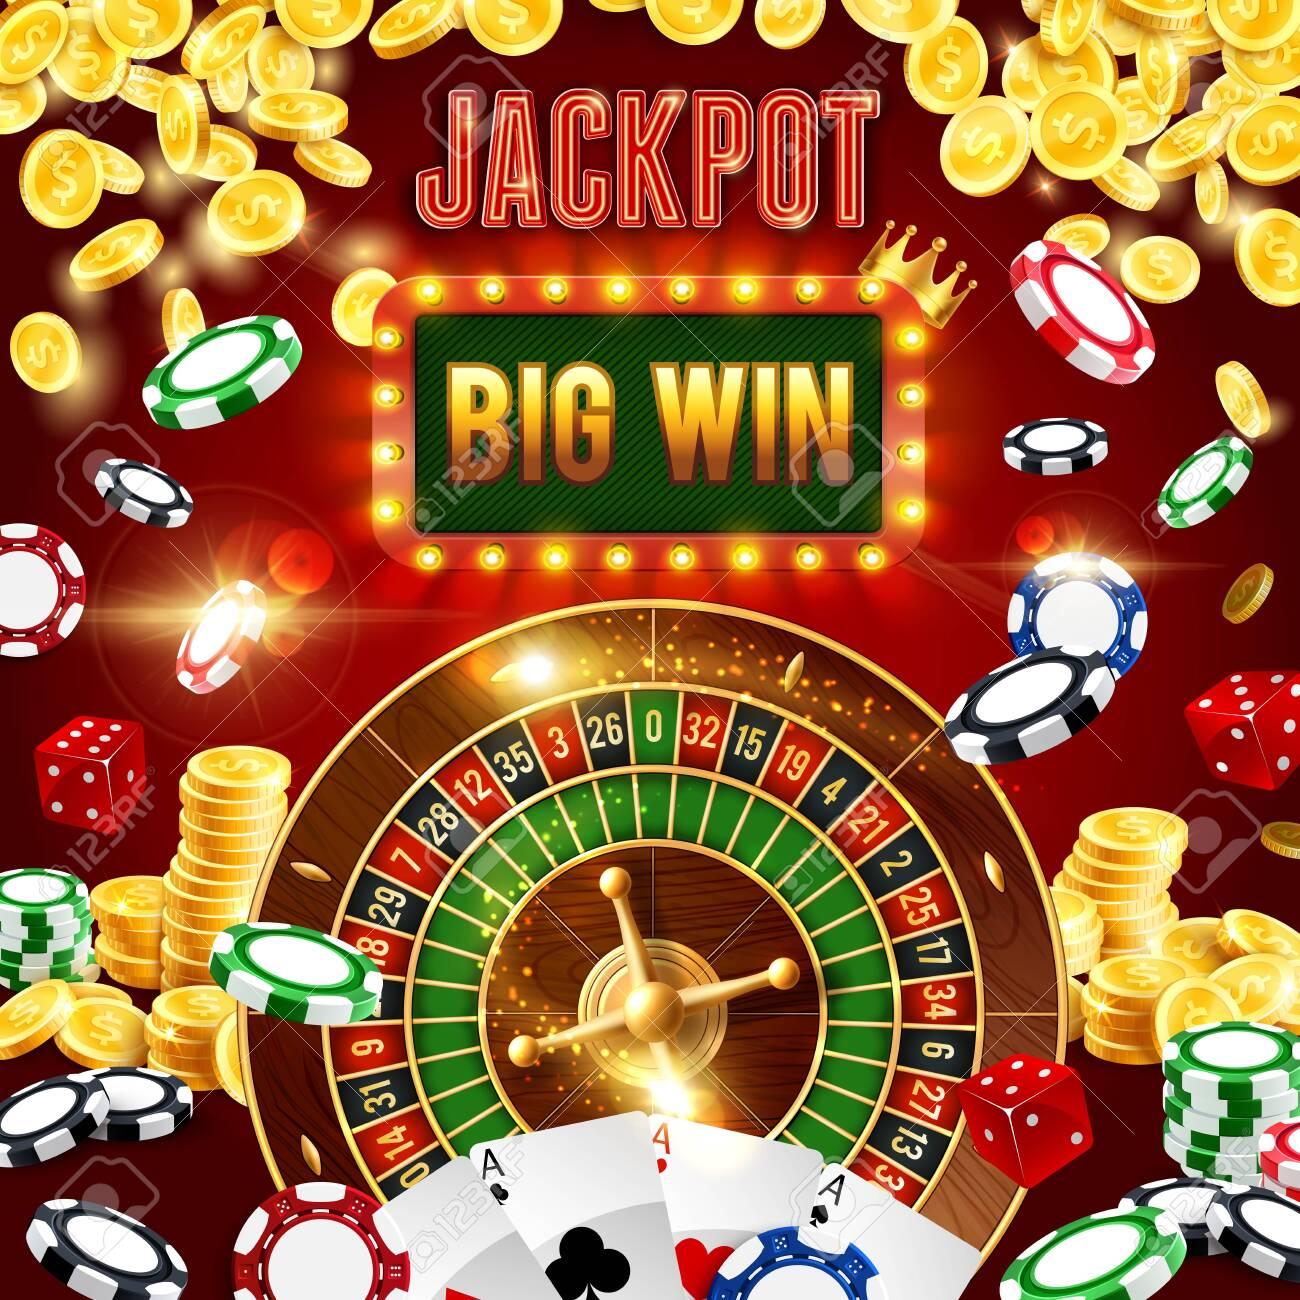 Big wheel casino